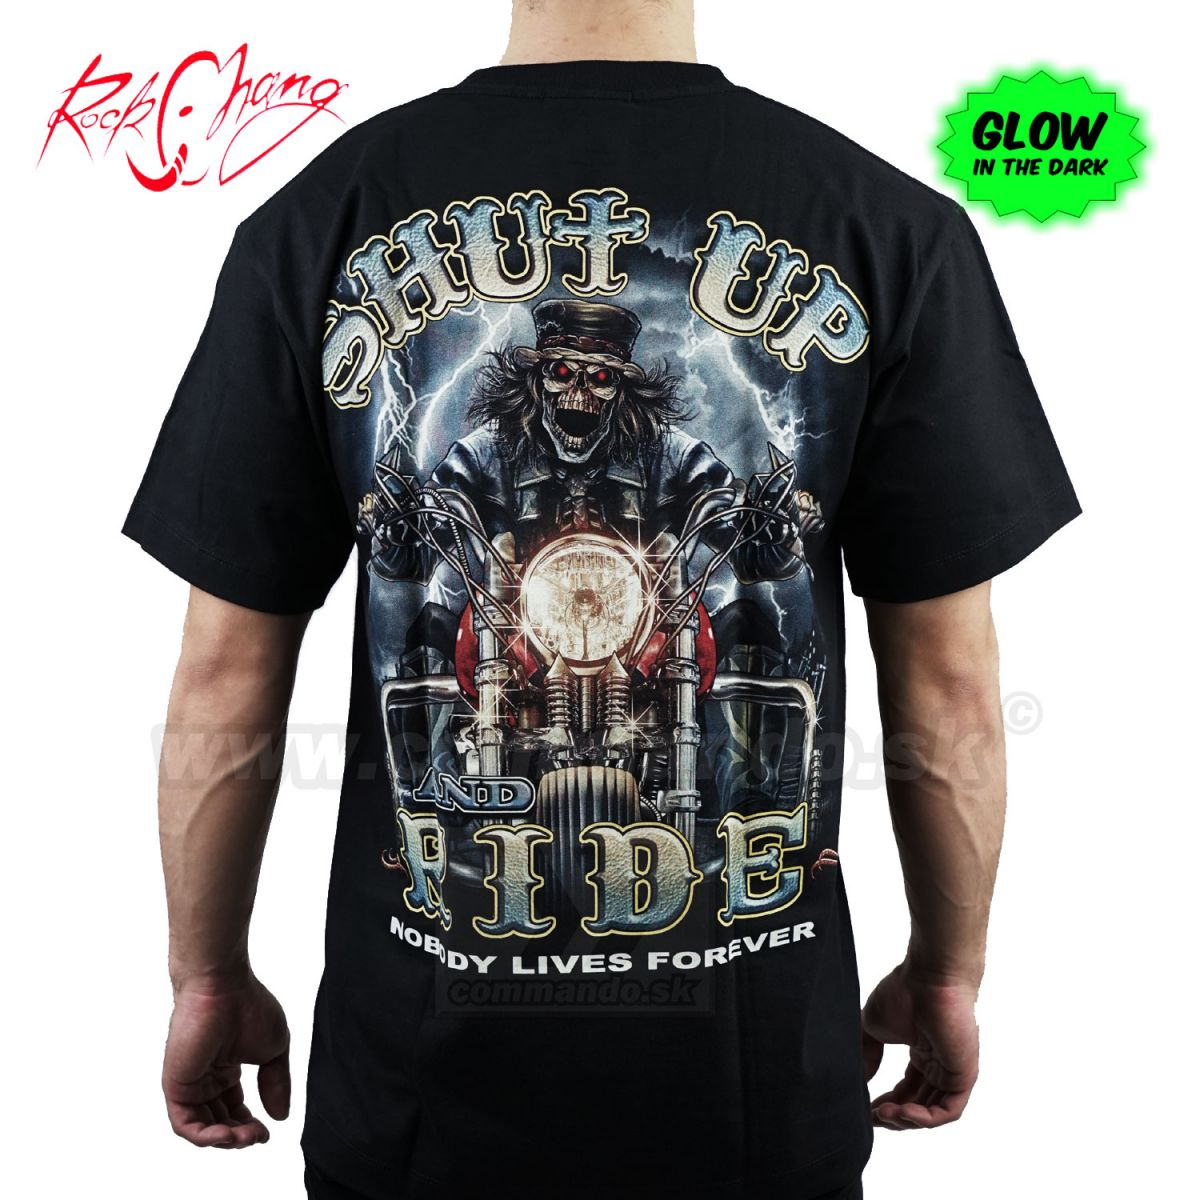 faa7674a5ed5 Tričko Shut Up Ride Rider Rock Chang GR413 T-Shirt